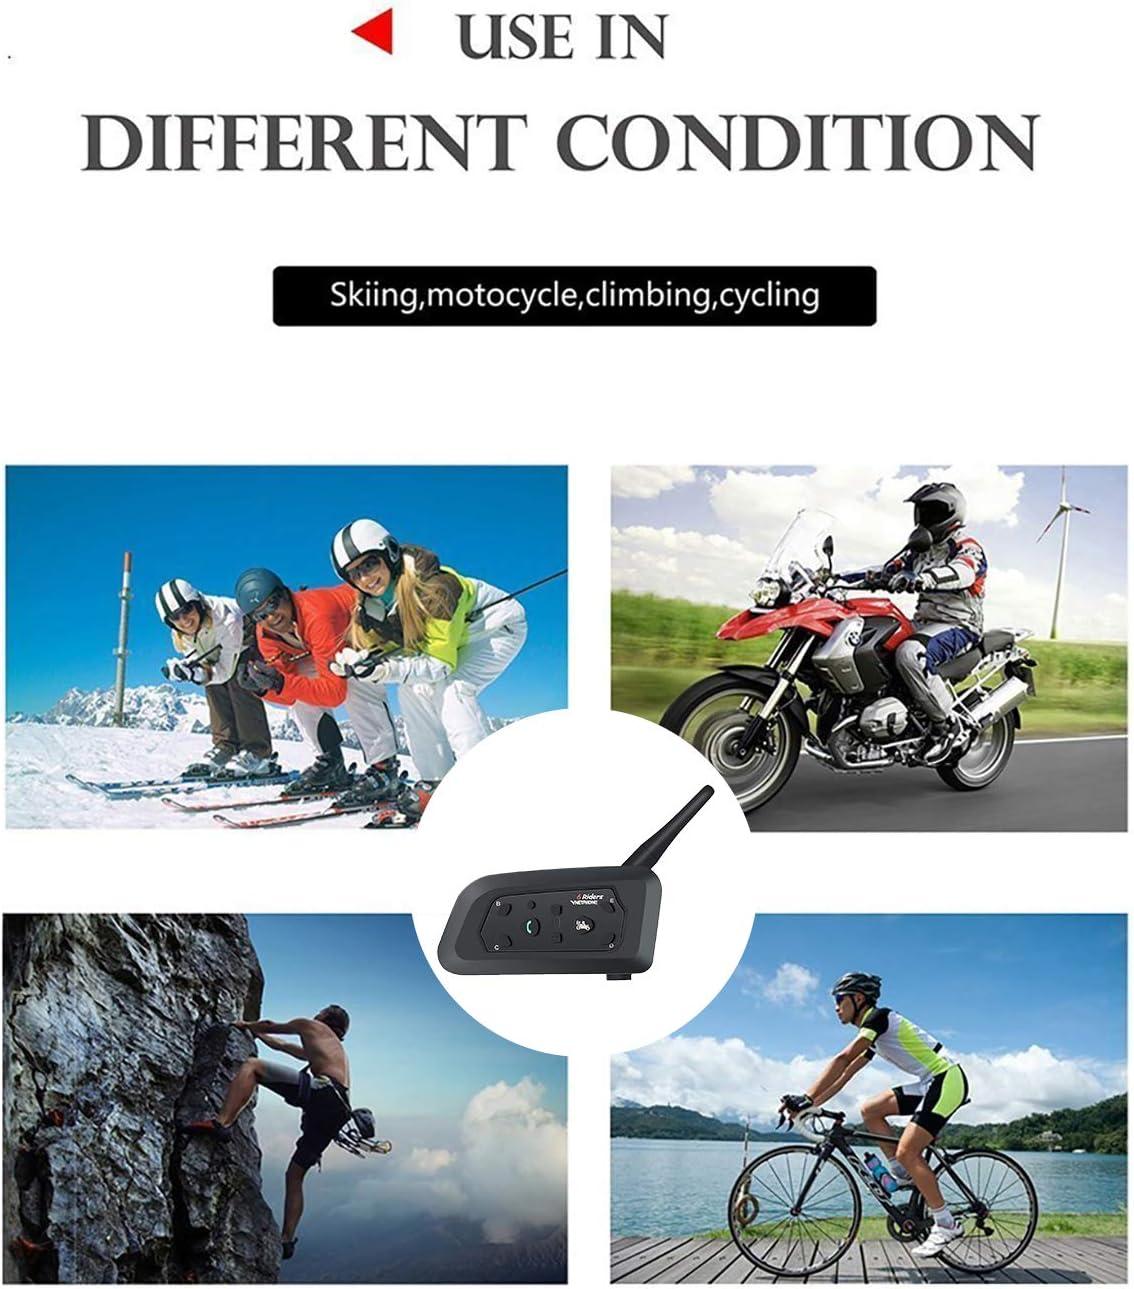 Motorcycle Helmet Bluetooth Intercom BT Multi Interphone Headset 1200M Bluetooth Motorbike Intercom Interphone Skiing Helmet Communication System Connect Up to 6 Riders V6 2 Pack